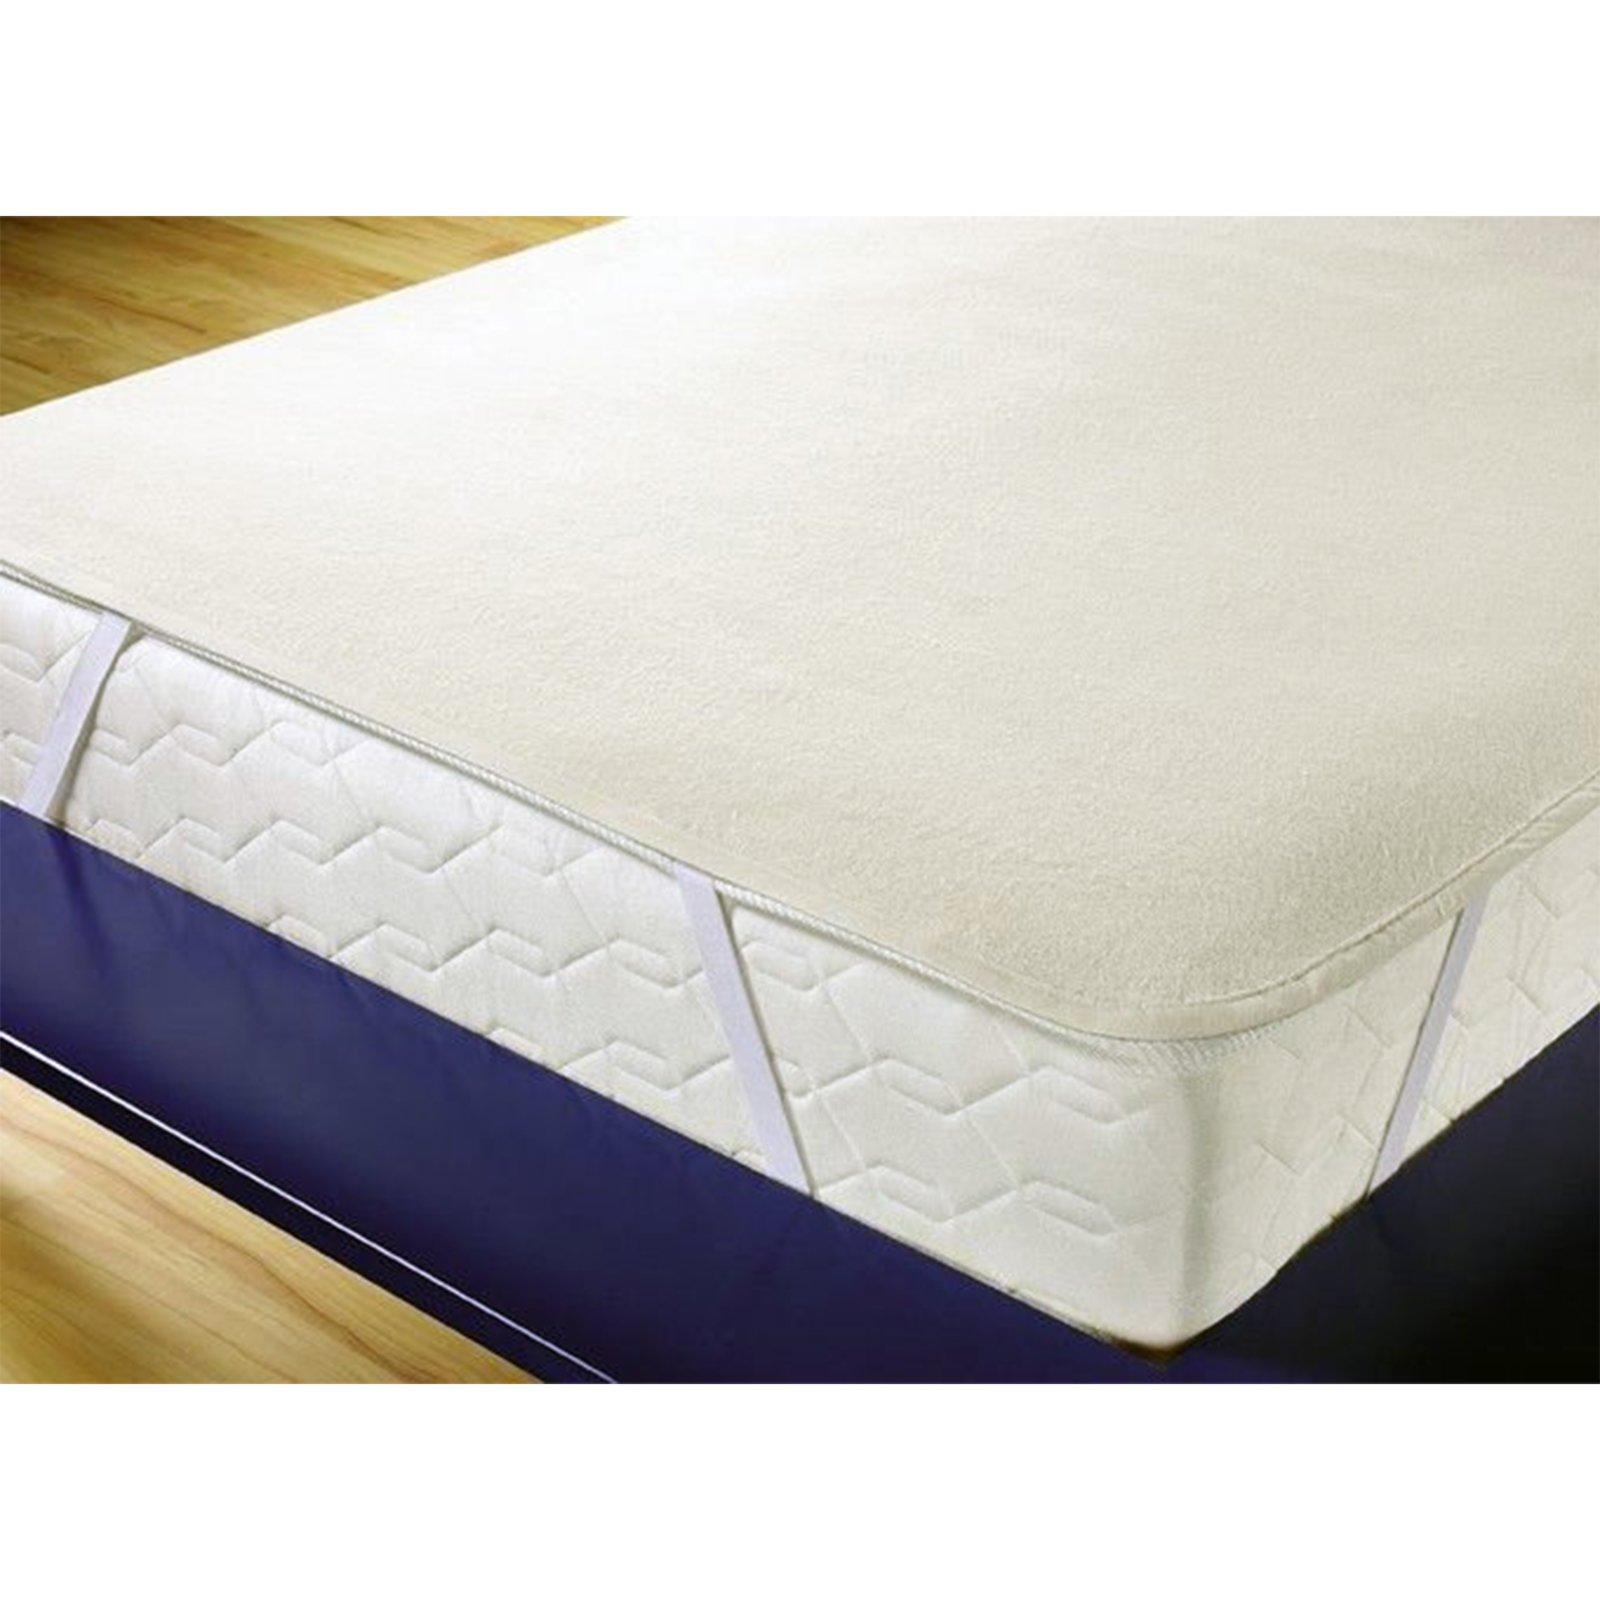 molton matratzenauflage standard 180x200 cm schoner. Black Bedroom Furniture Sets. Home Design Ideas